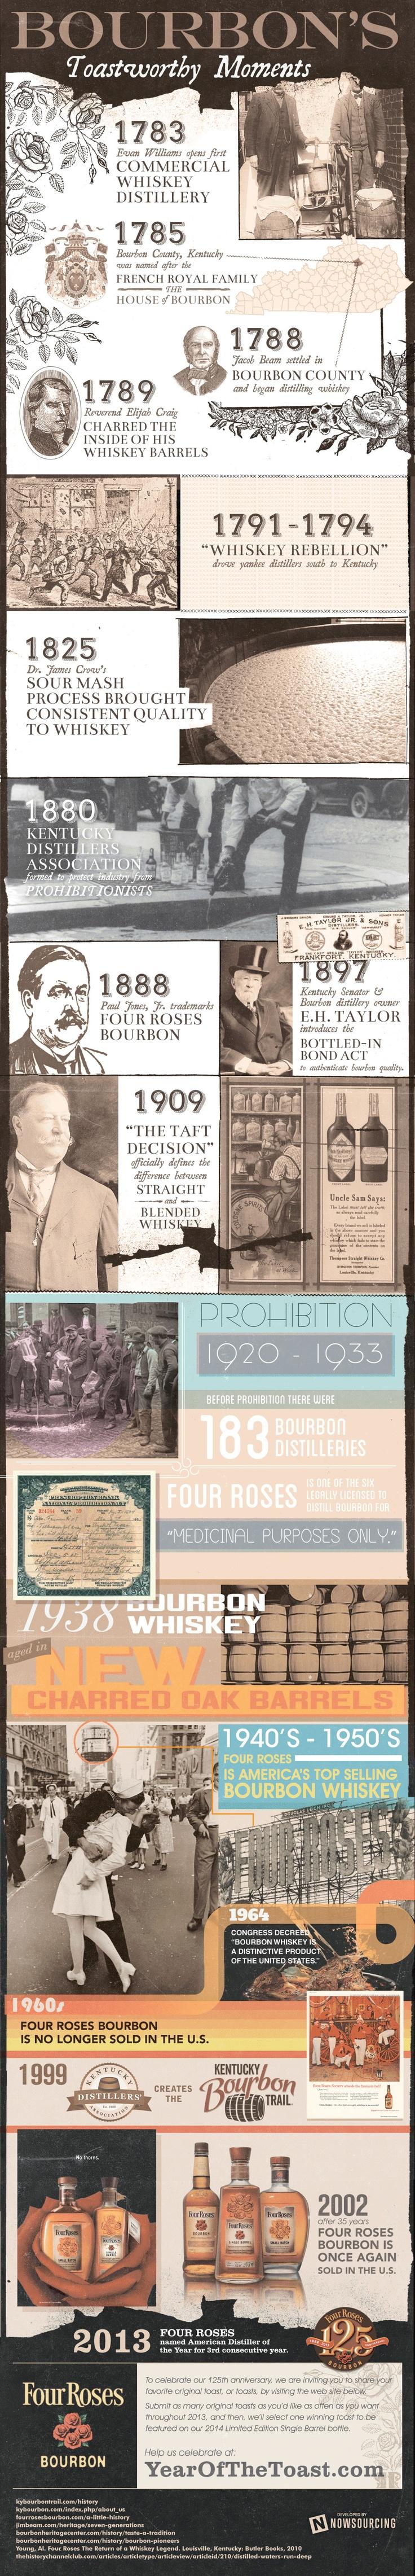 Four Roses / Bourbon infographic.